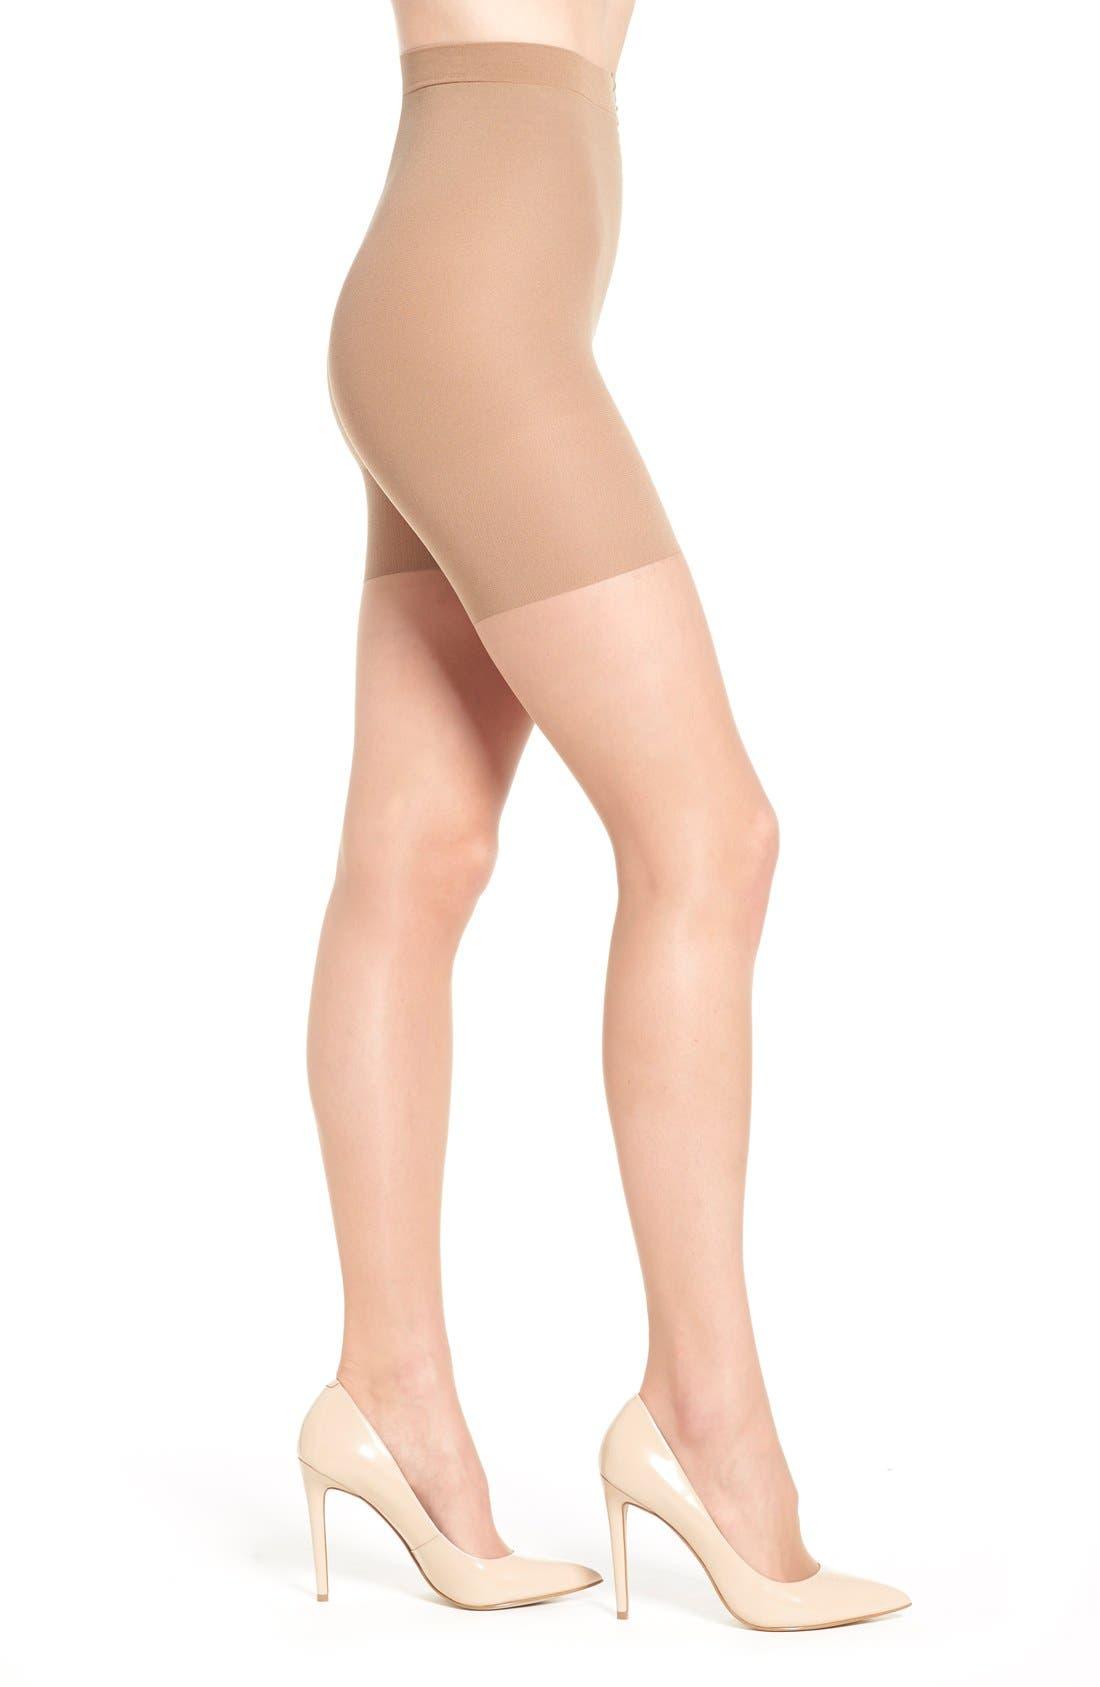 Luxe Leg Pantyhose,                         Main,                         color, NUDE 4